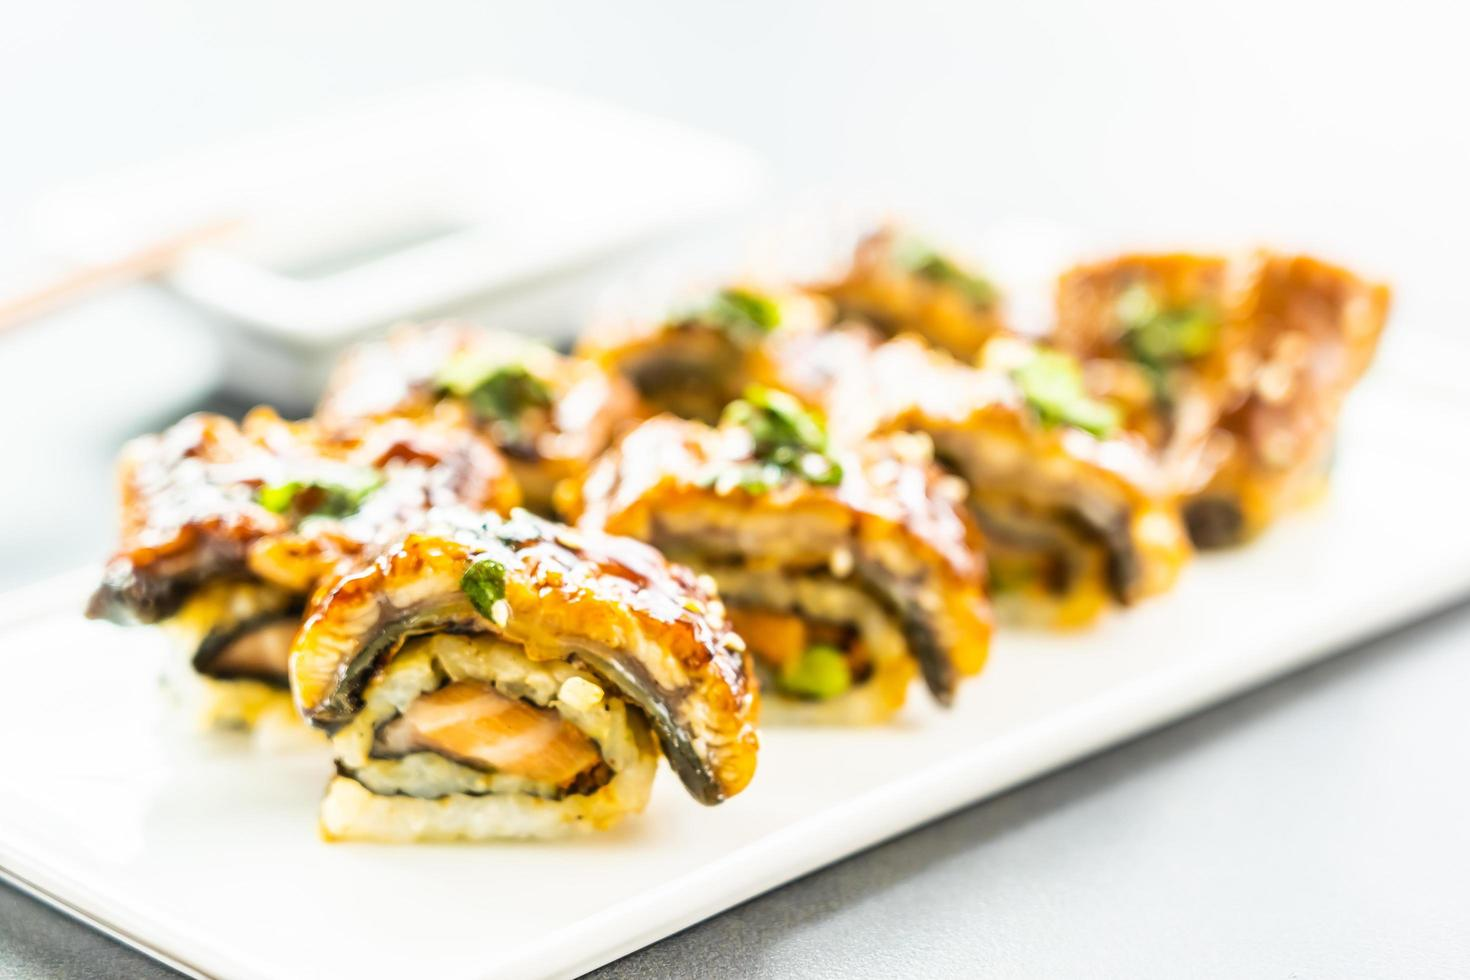 anguila a la parrilla o sushi de pescado unagi maki roll foto